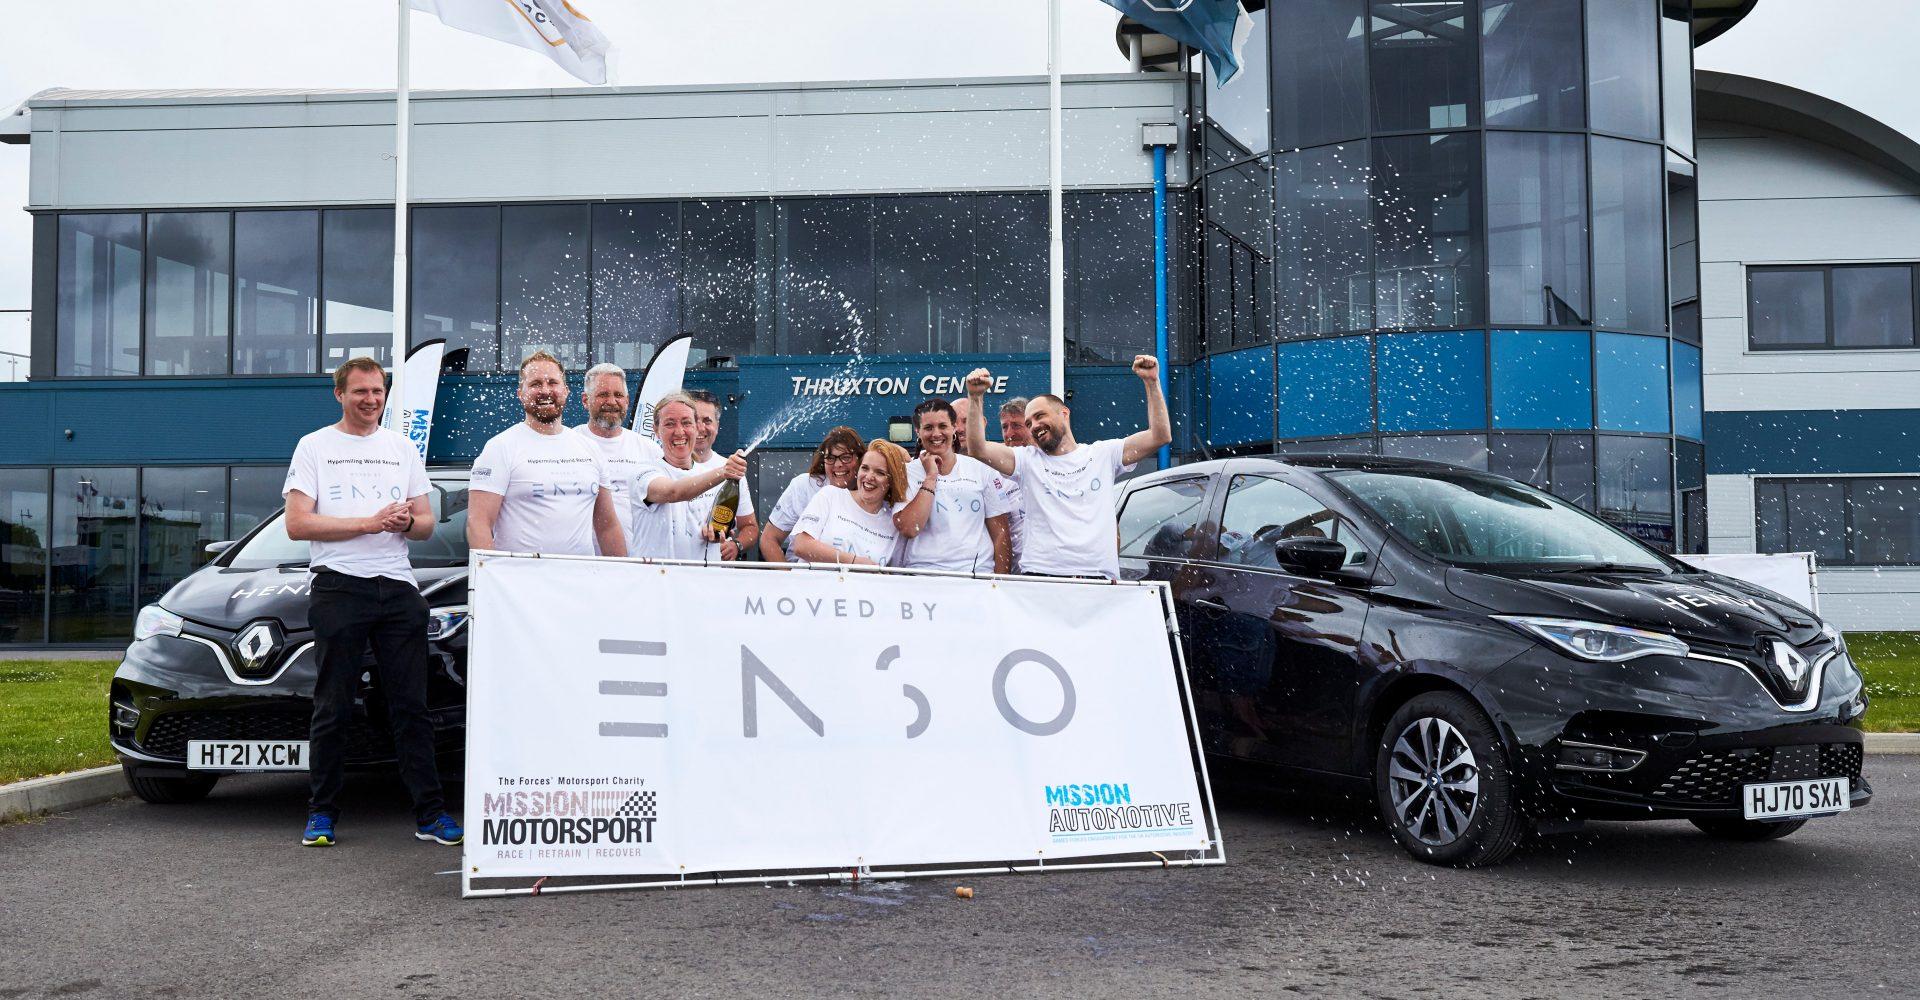 Mission Motorsport sets electric car hypermile record